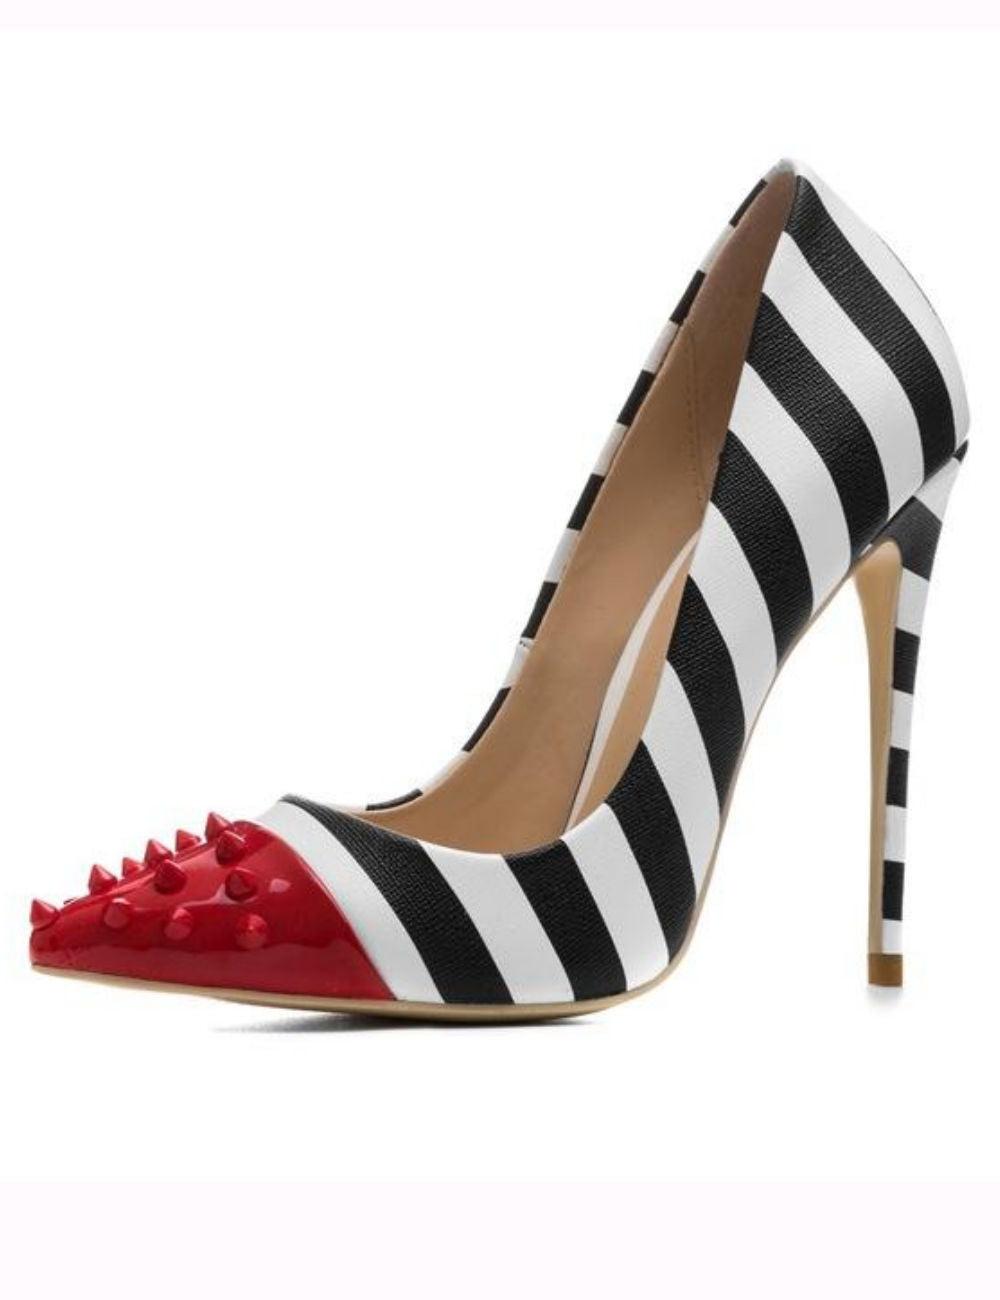 My TrueLov Stilettos High Heels Pointed Toe